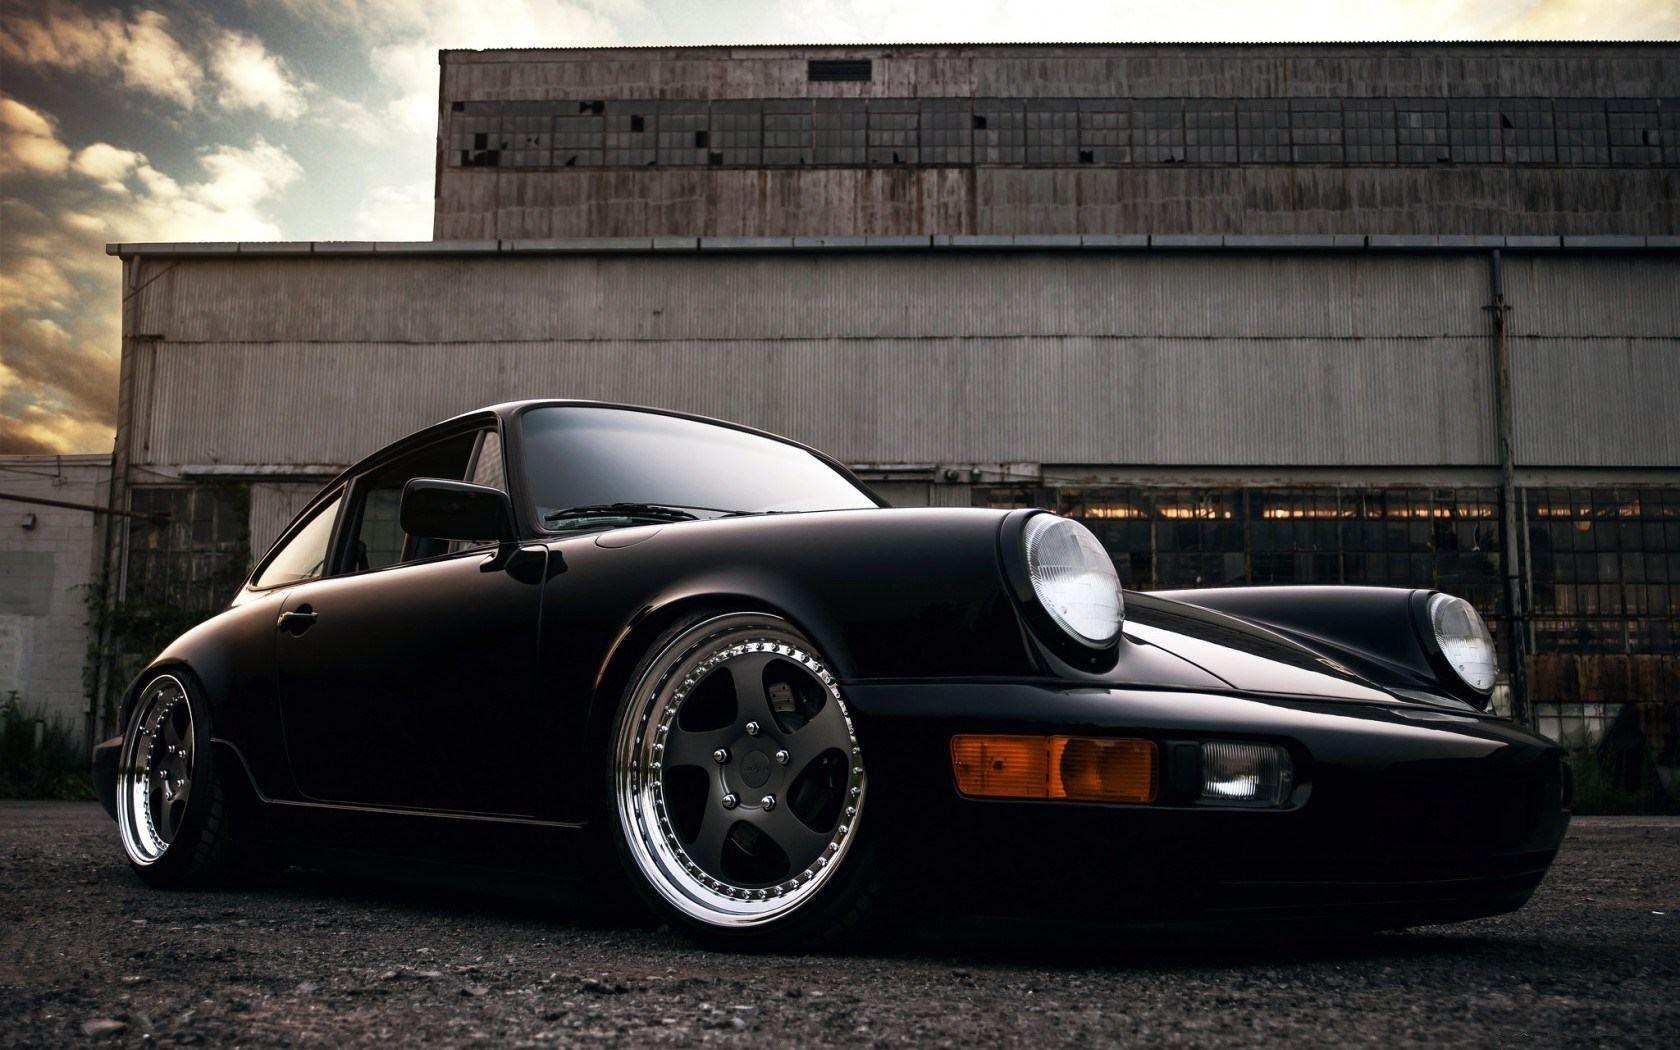 2004 Black PORSCHE CARRERA GT for sale for £875000 in